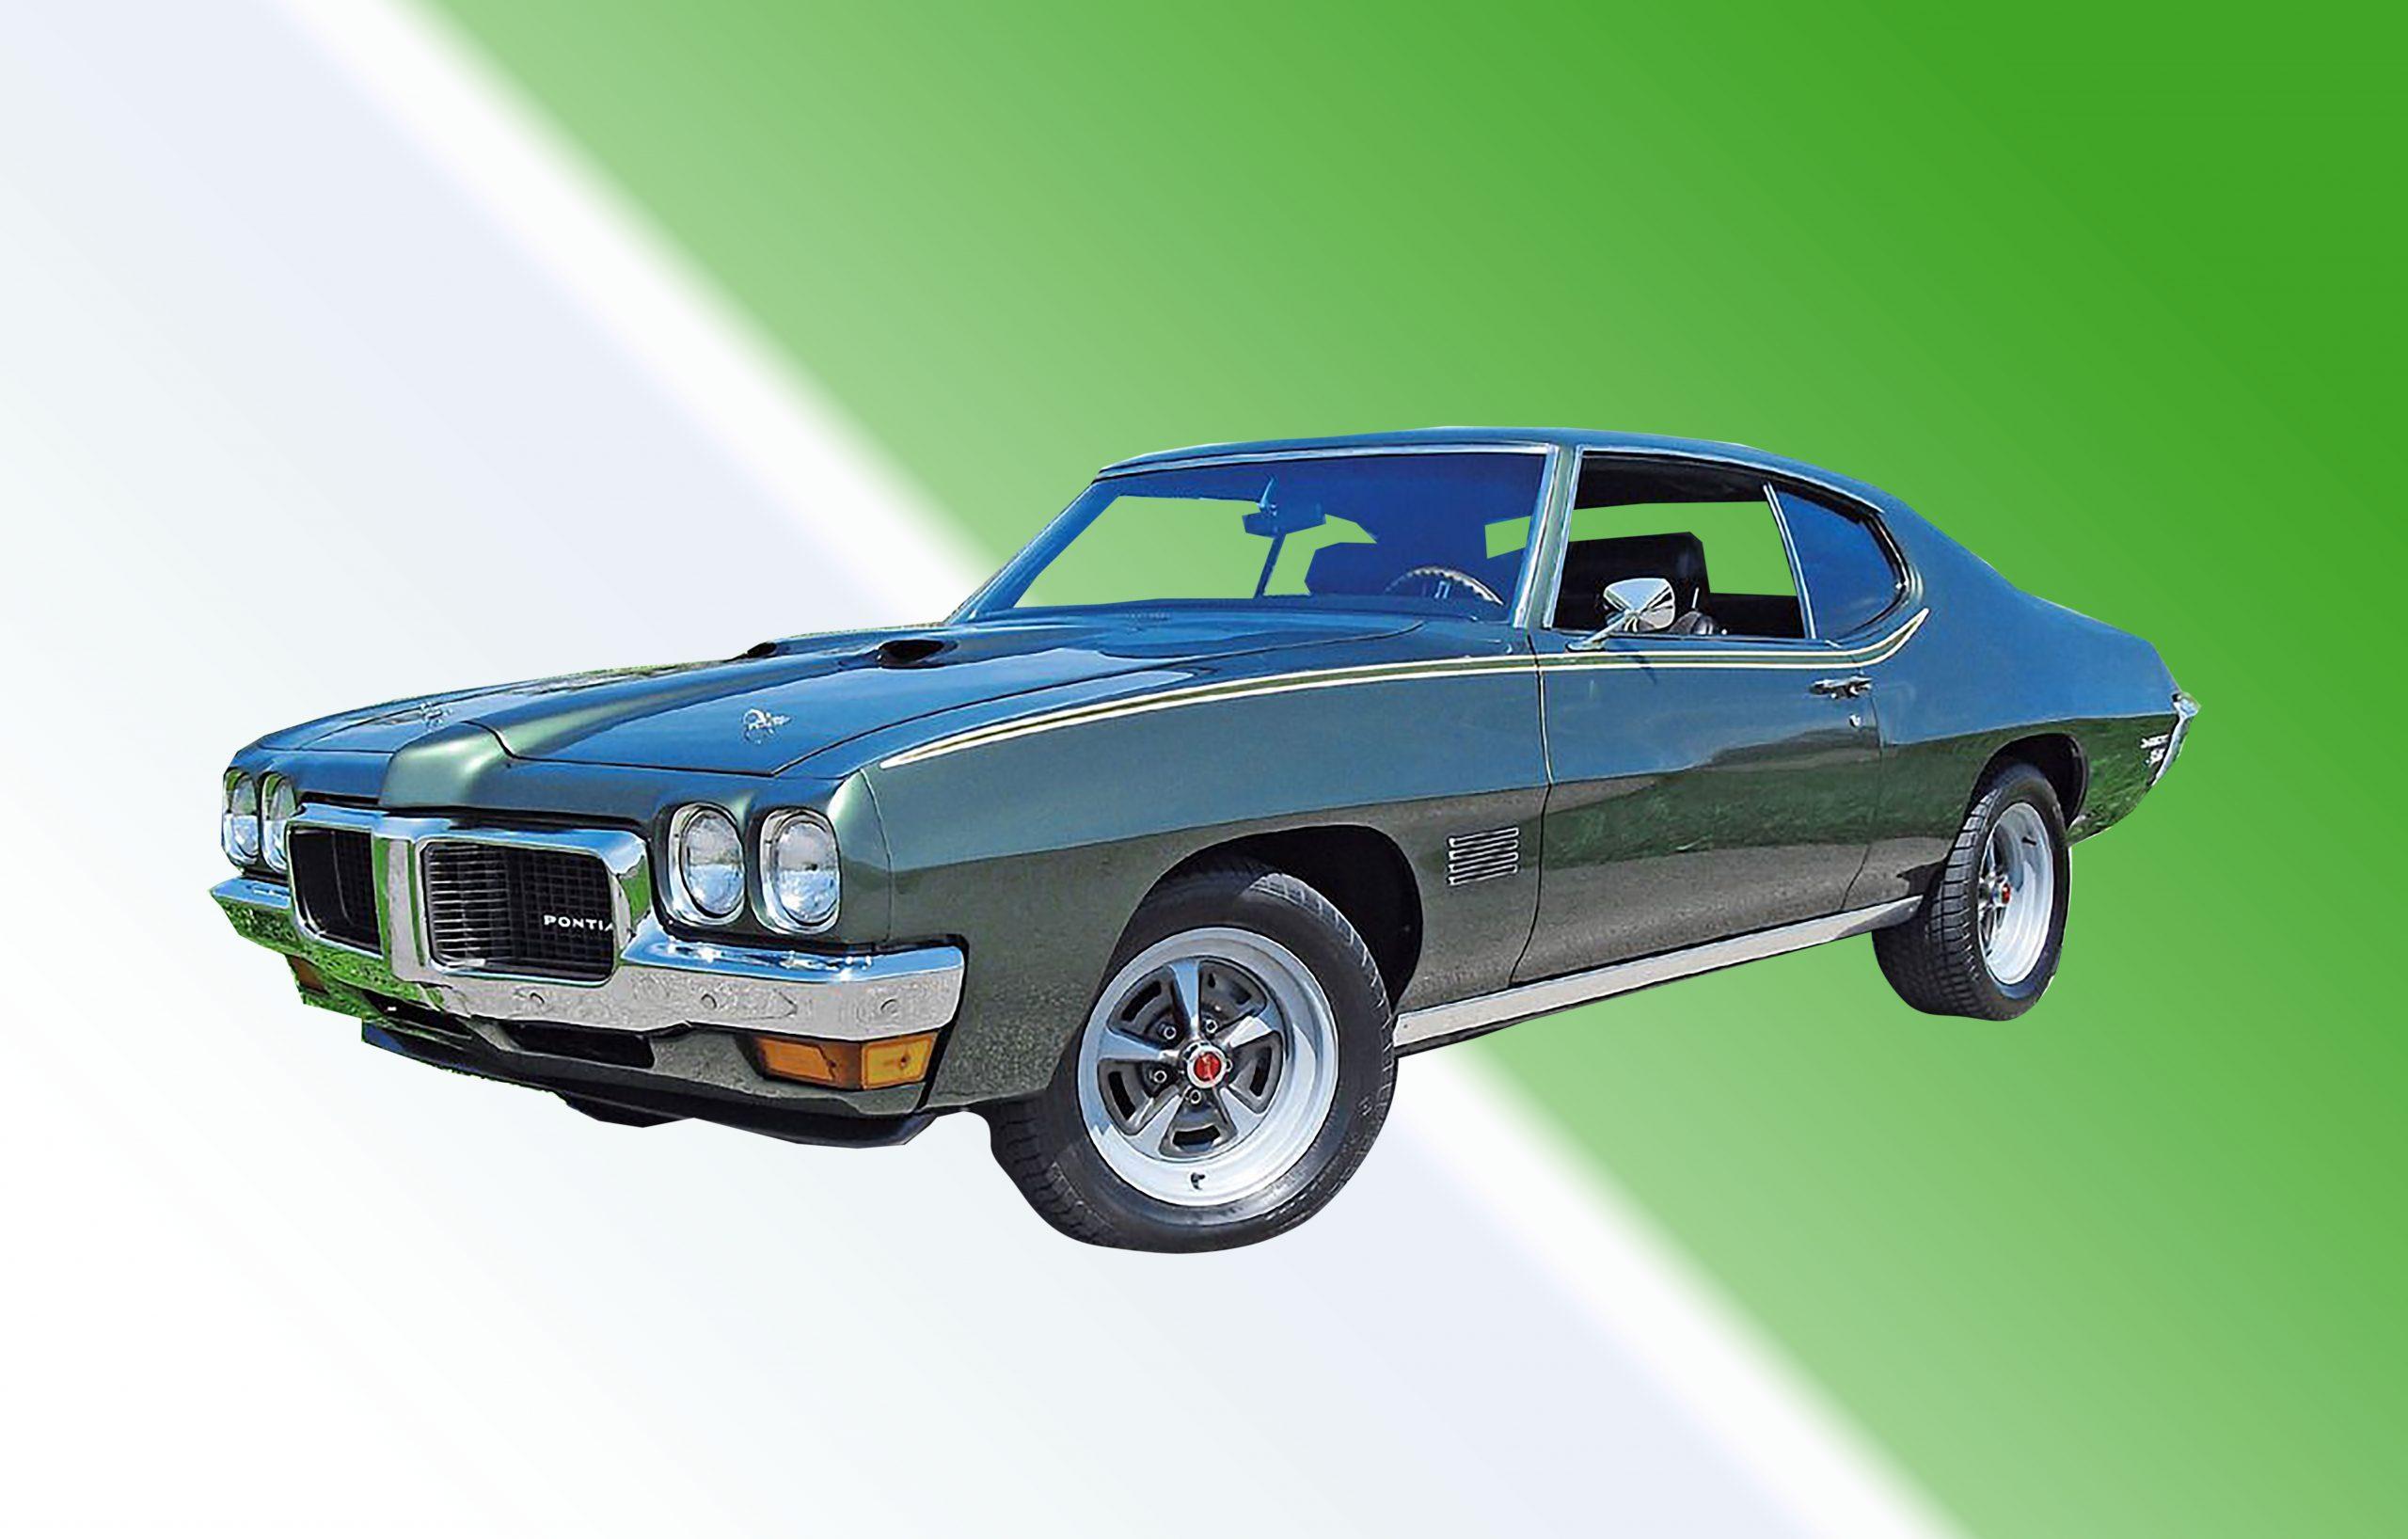 Pontiac Motor Cars